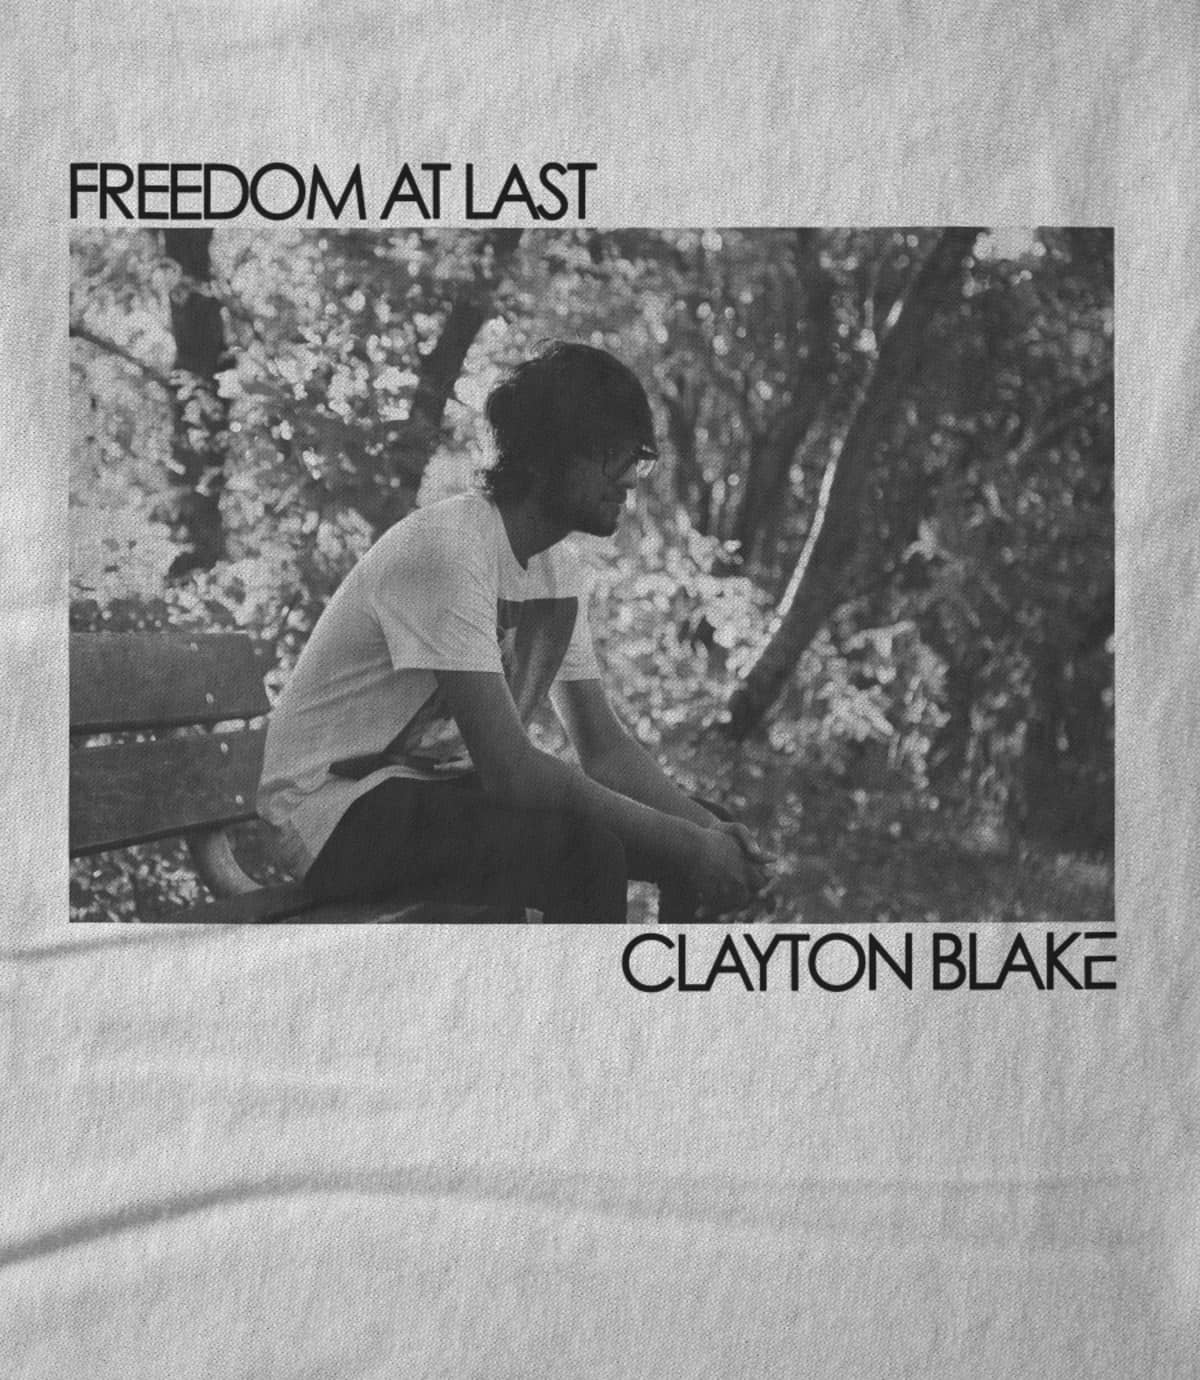 Clayton blake freedom at last 1495348496